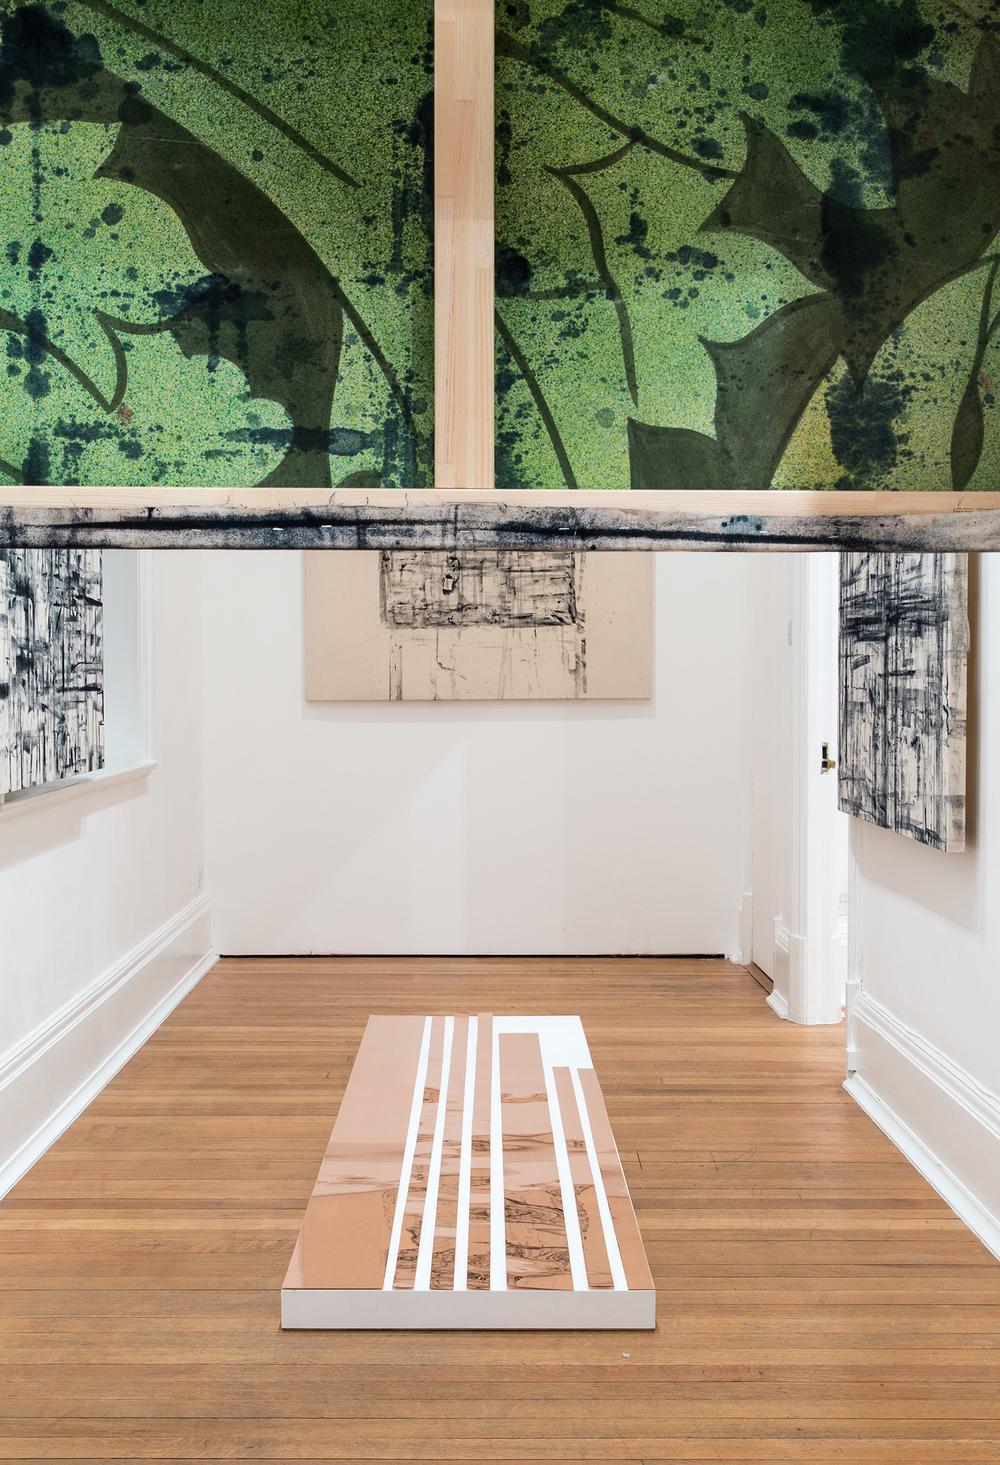 Marginalia   Thomas Dane Gallery  London  United Kingdom  2014